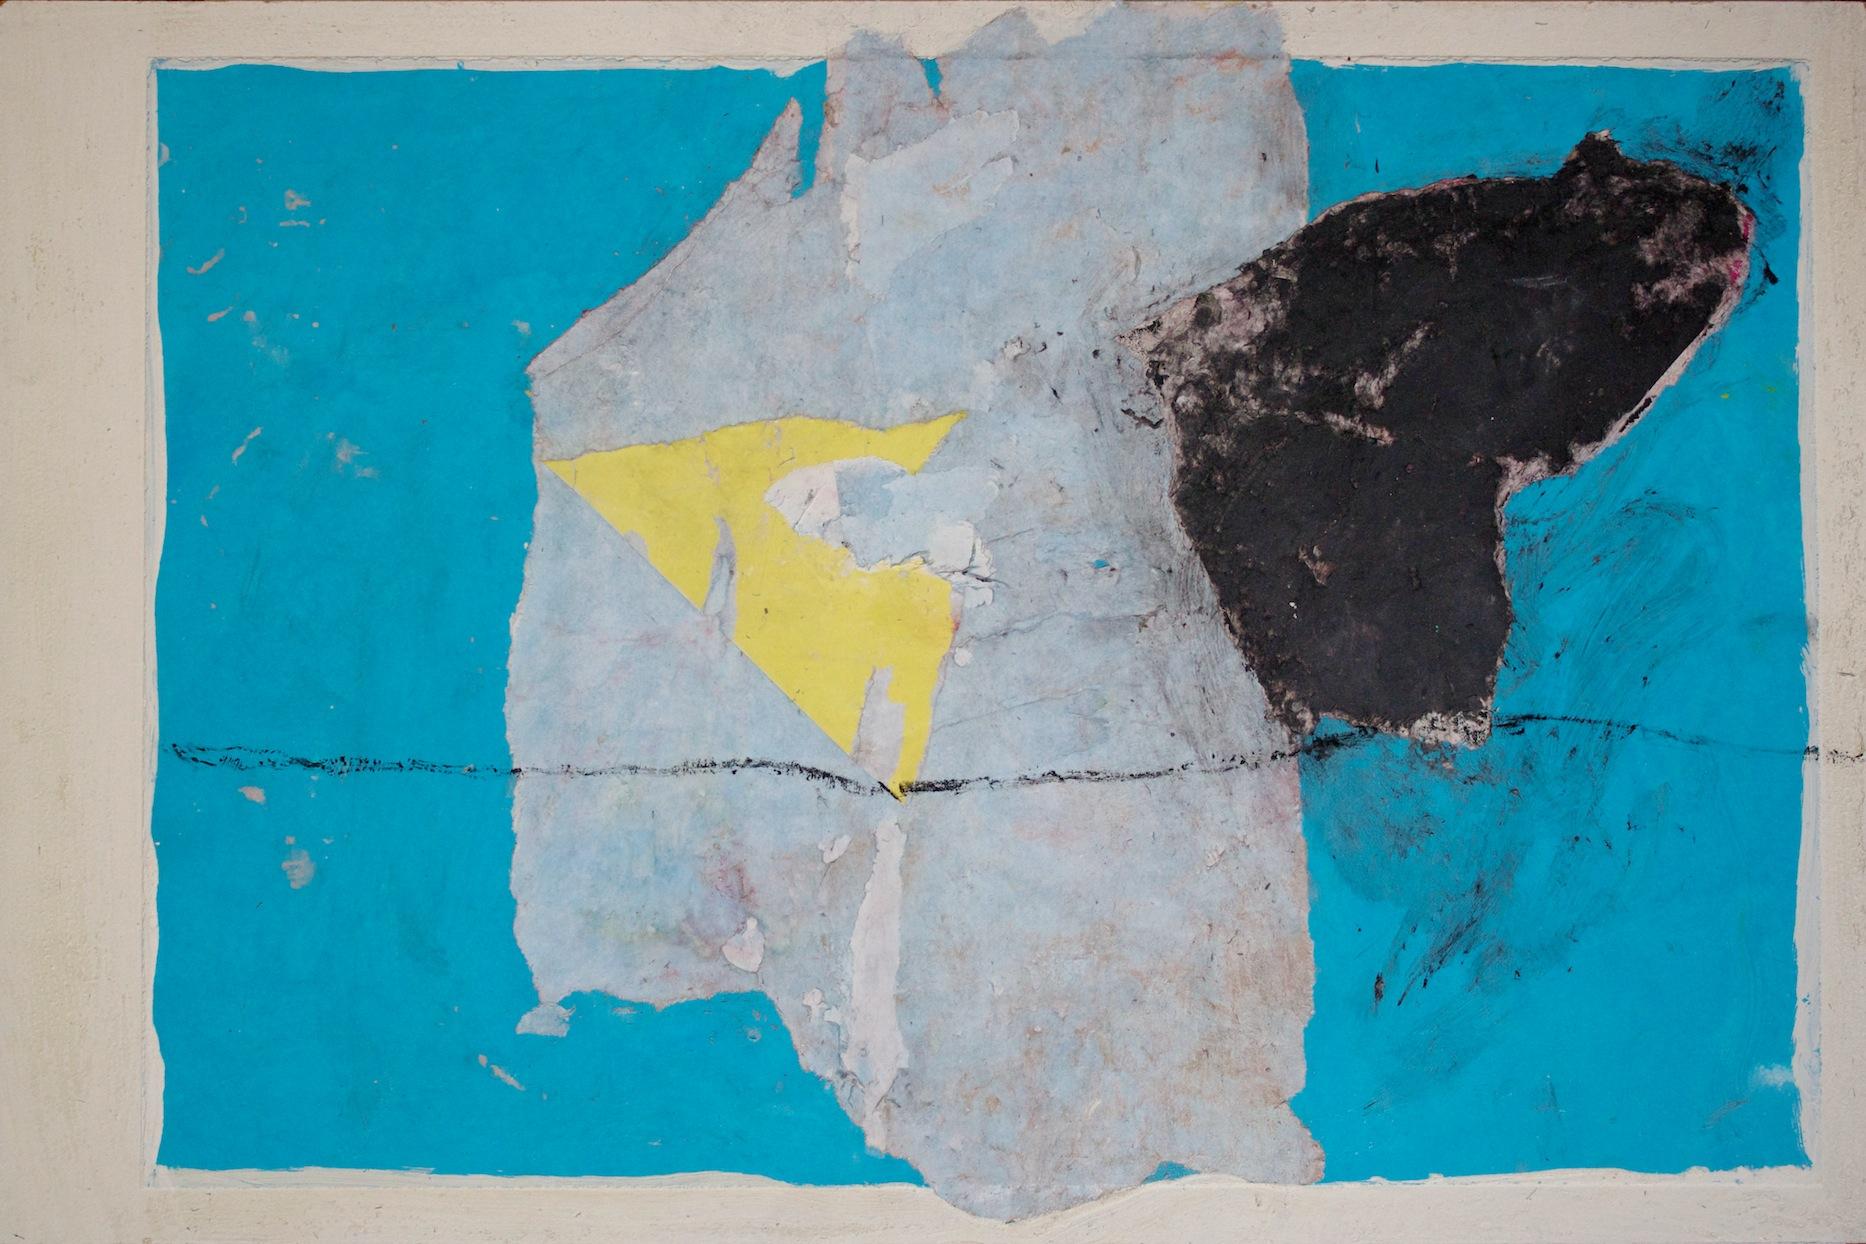 Marcello Mariani - Forma Archetipa - tar, coal dust and collage on masonite - 2009